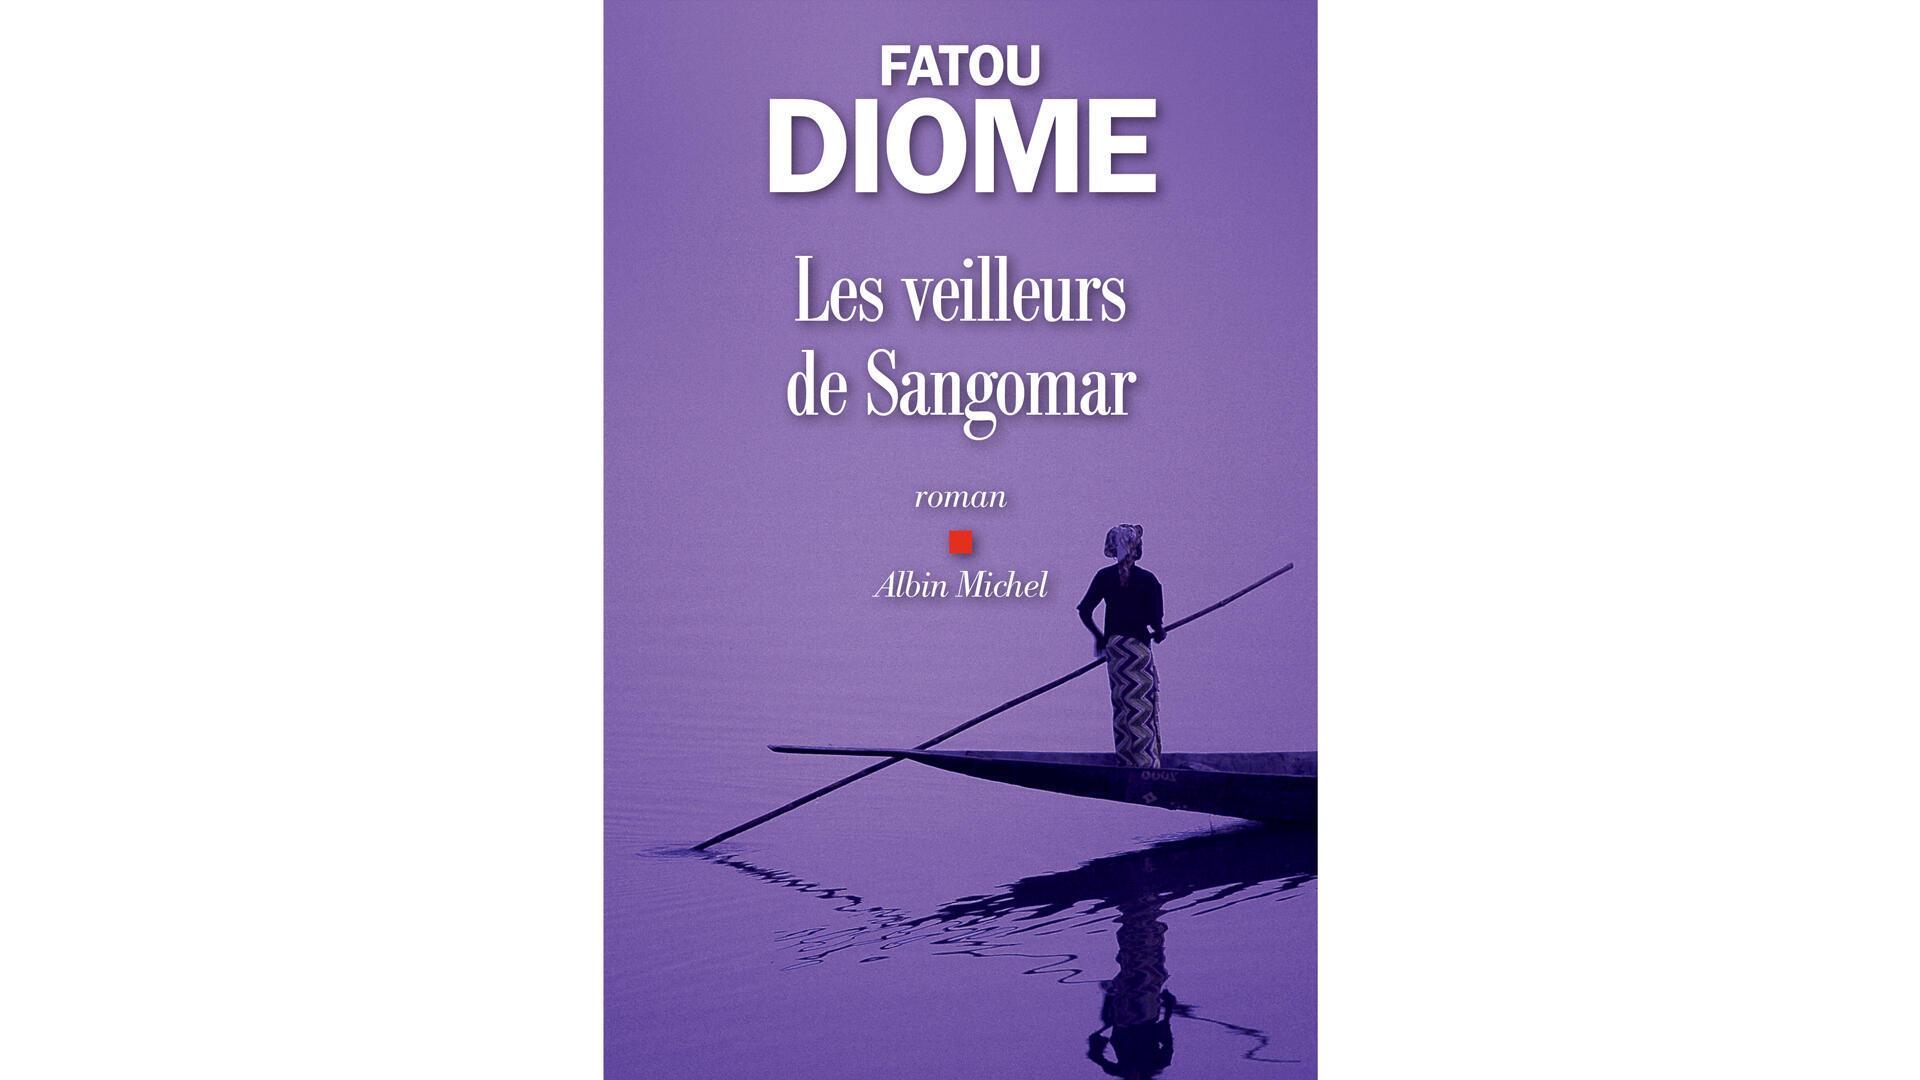 «Les veilleurs de Sangomar», de Fatou Diome.